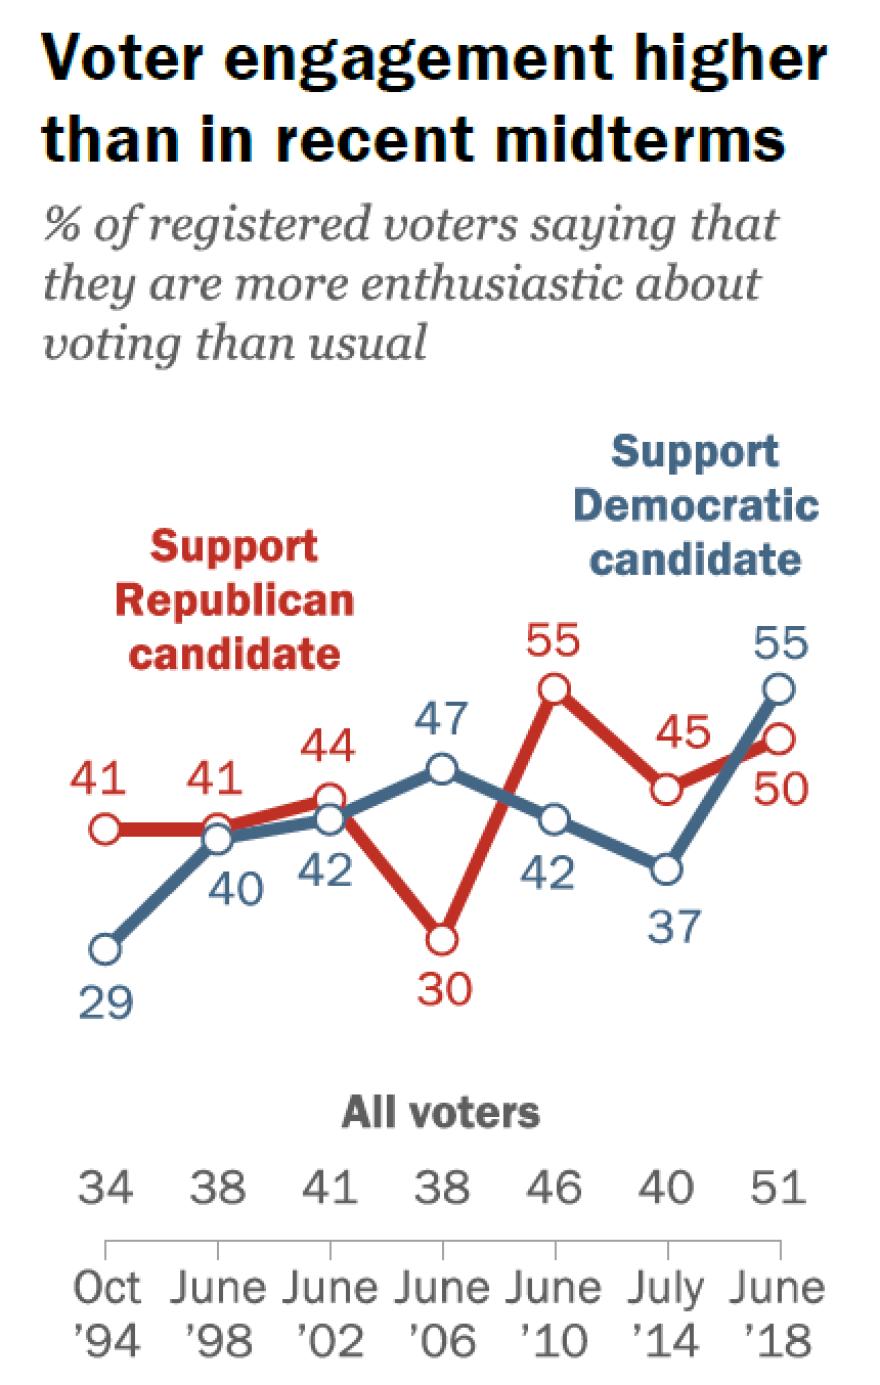 Democrats have a slight advantage in enthusiasm over Republicans.